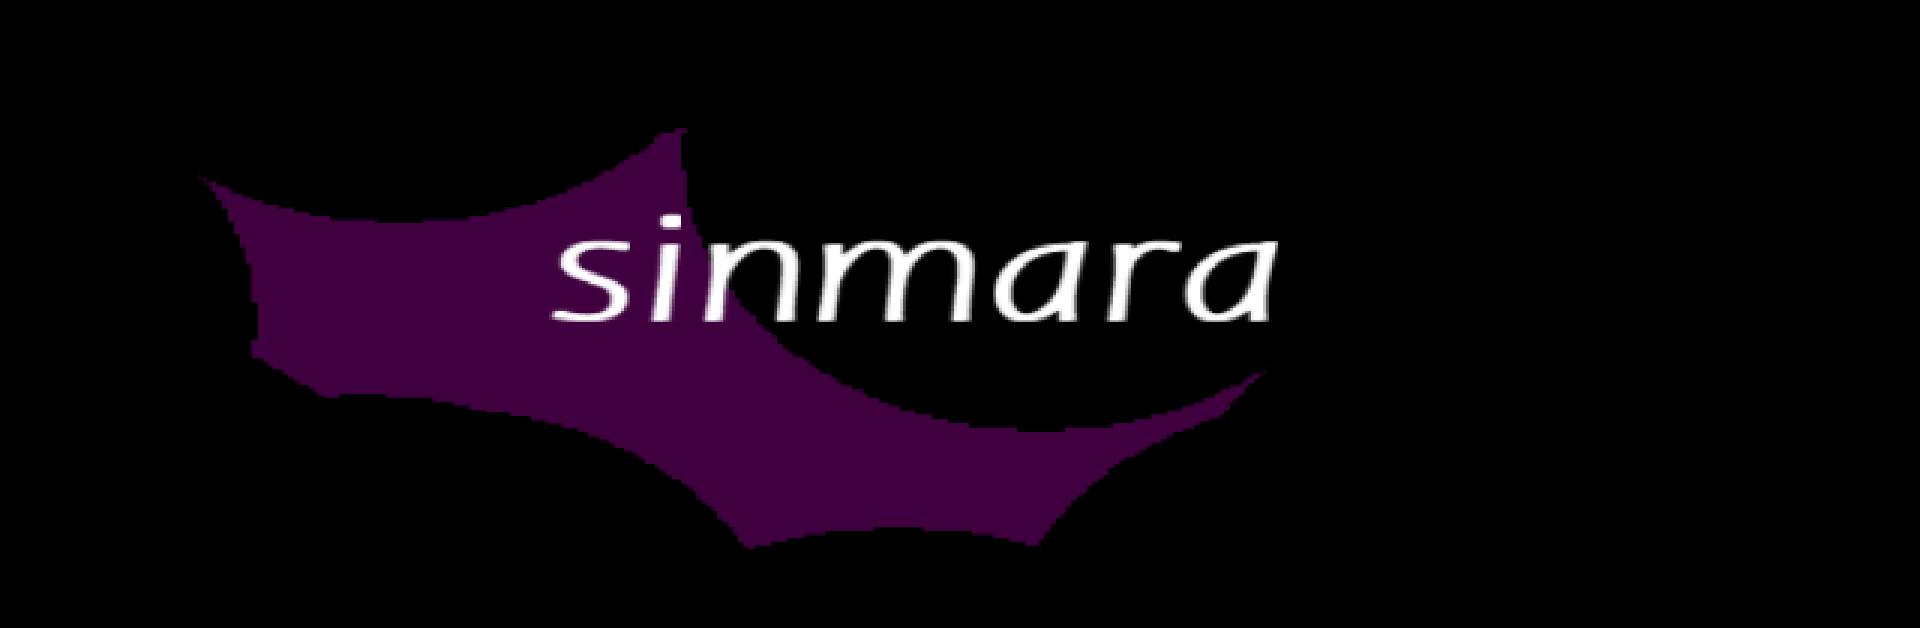 Sinmara